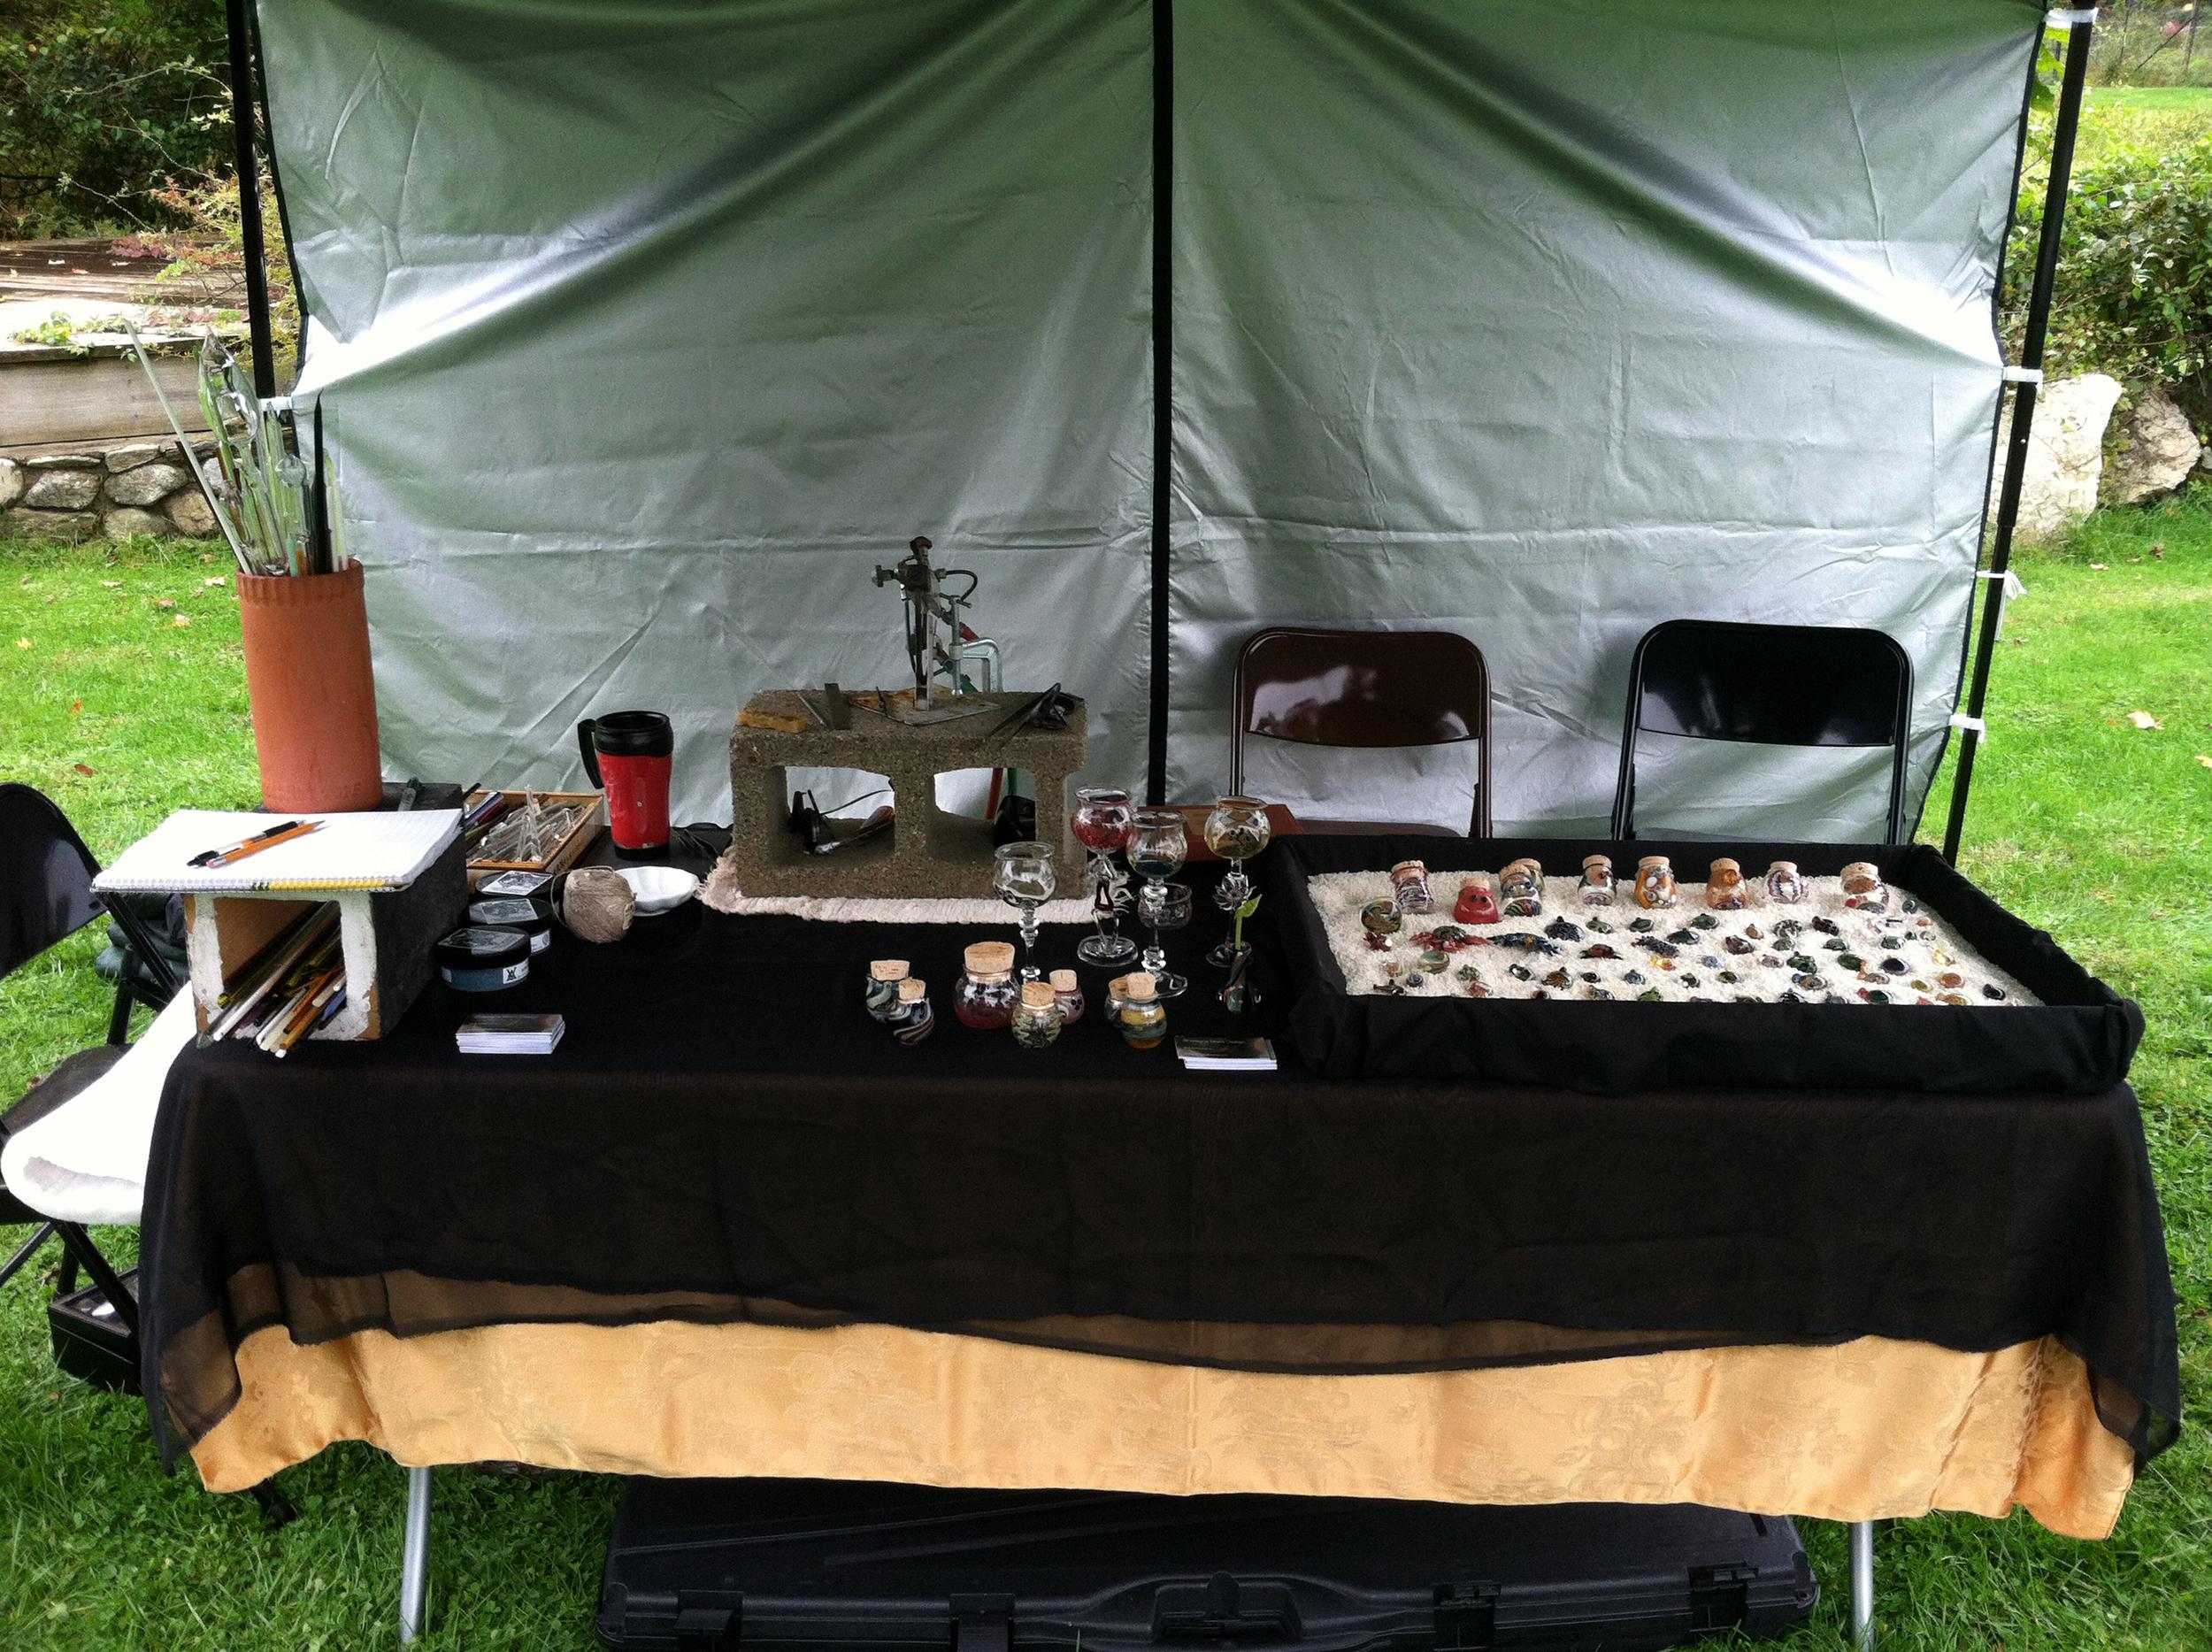 Gramigna Glass booth setup at 2012 South Salem Library Fair in South Salem, NY.